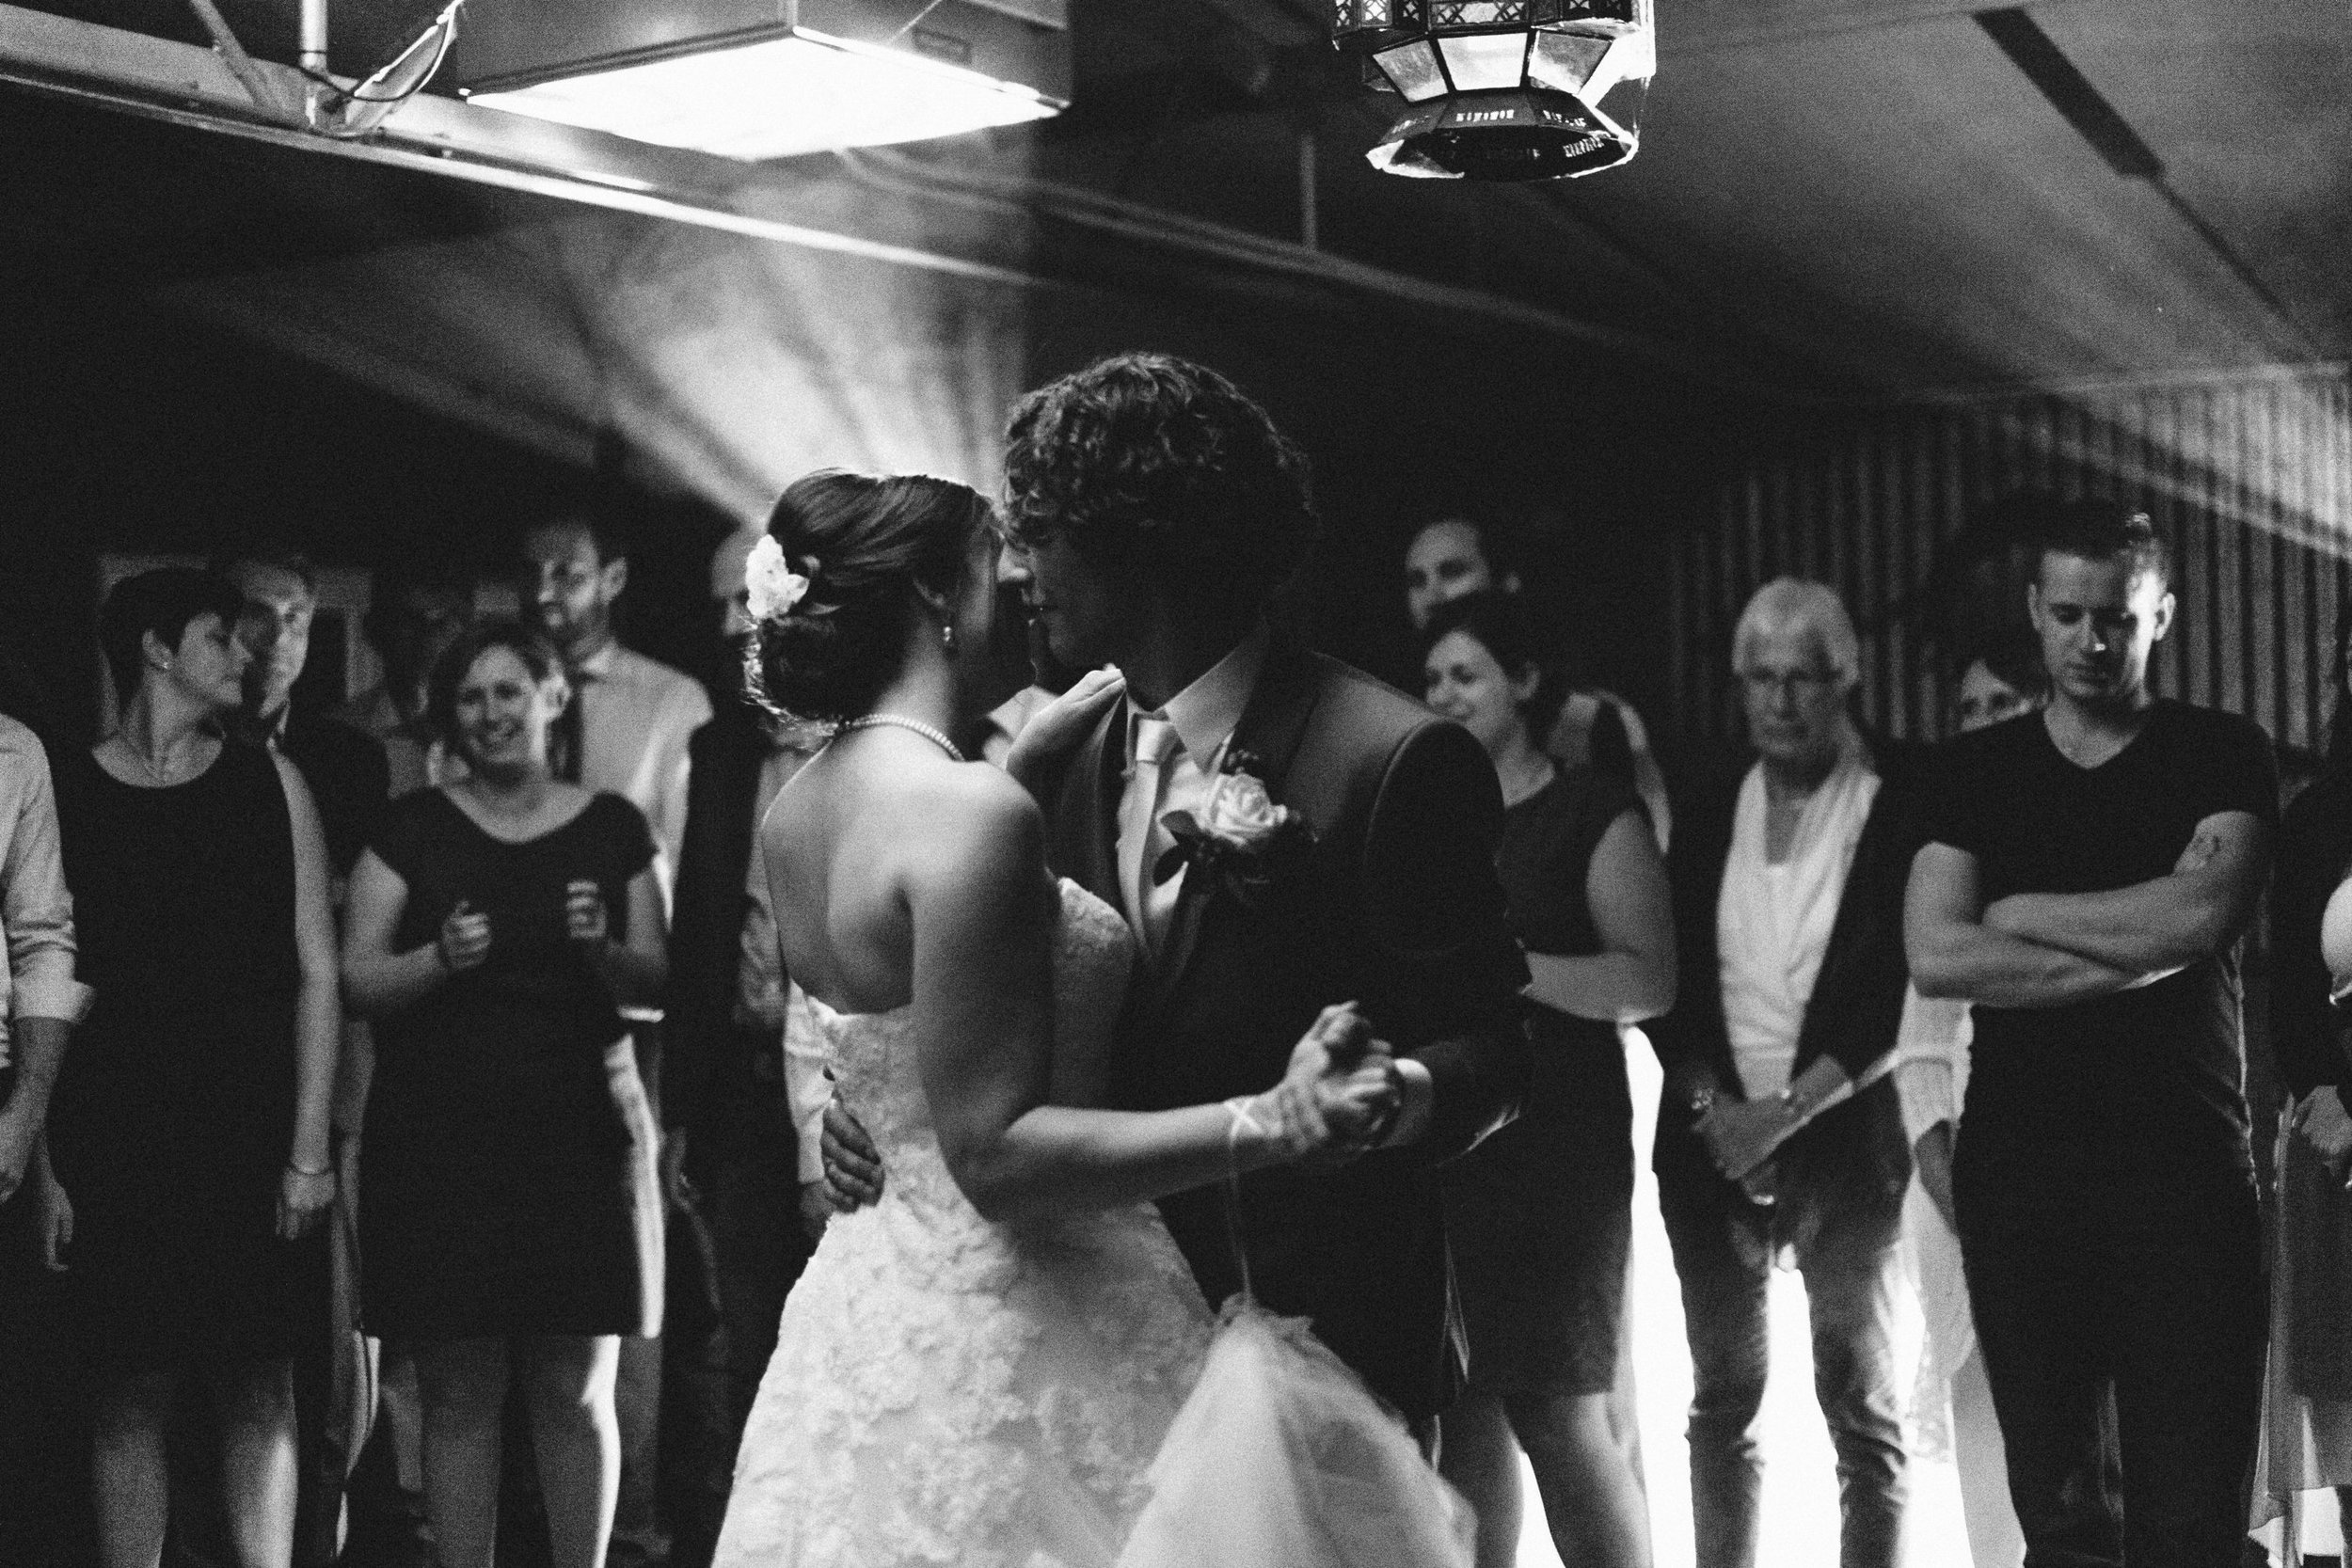 Bruidsfotografie-Terschelling-Michiel-Janette_0193.jpg